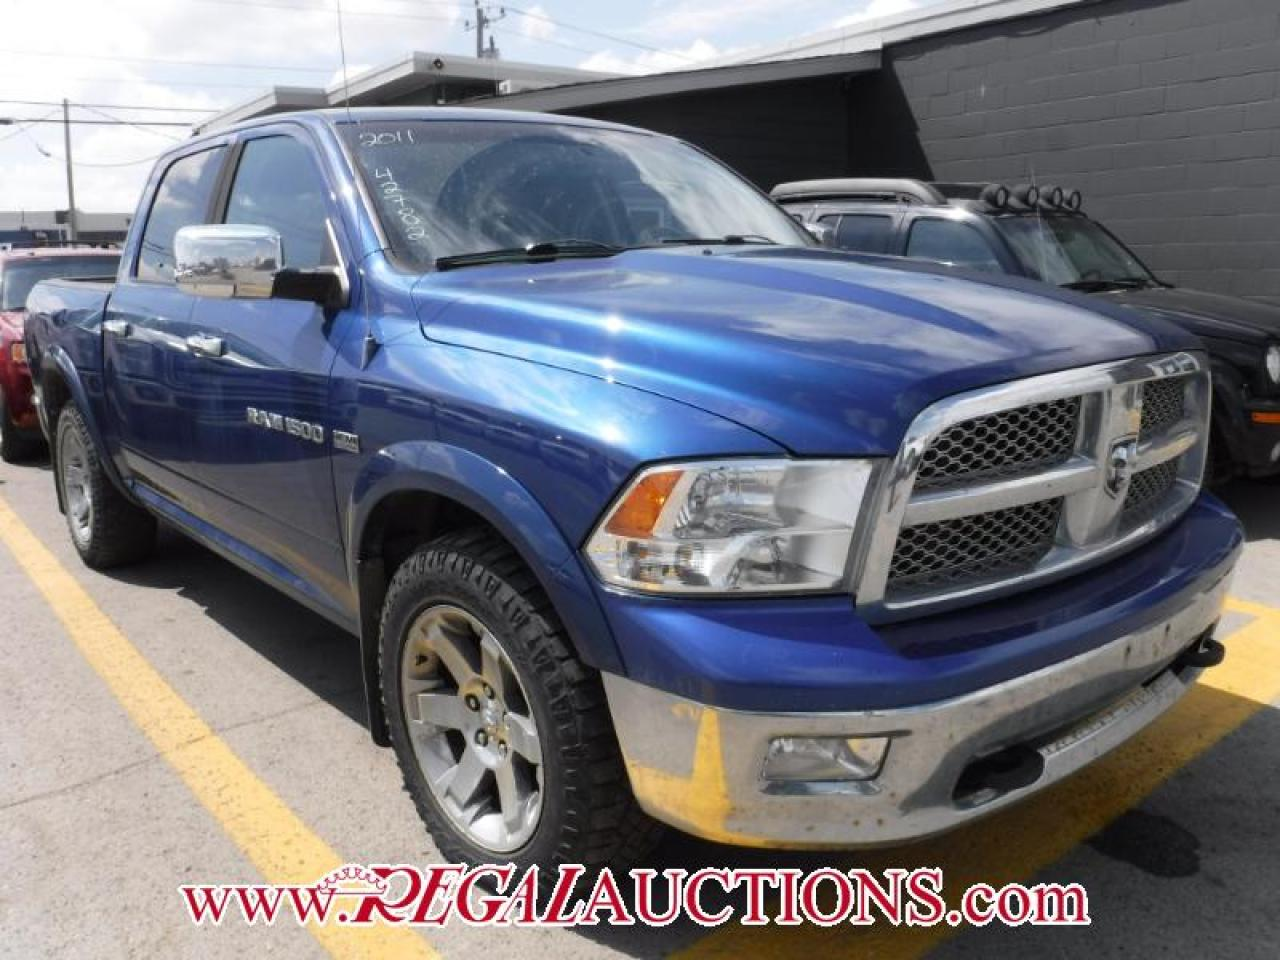 Photo of Blue 2011 Dodge RAM 1500 LARAMIE CREW CAB 4WD